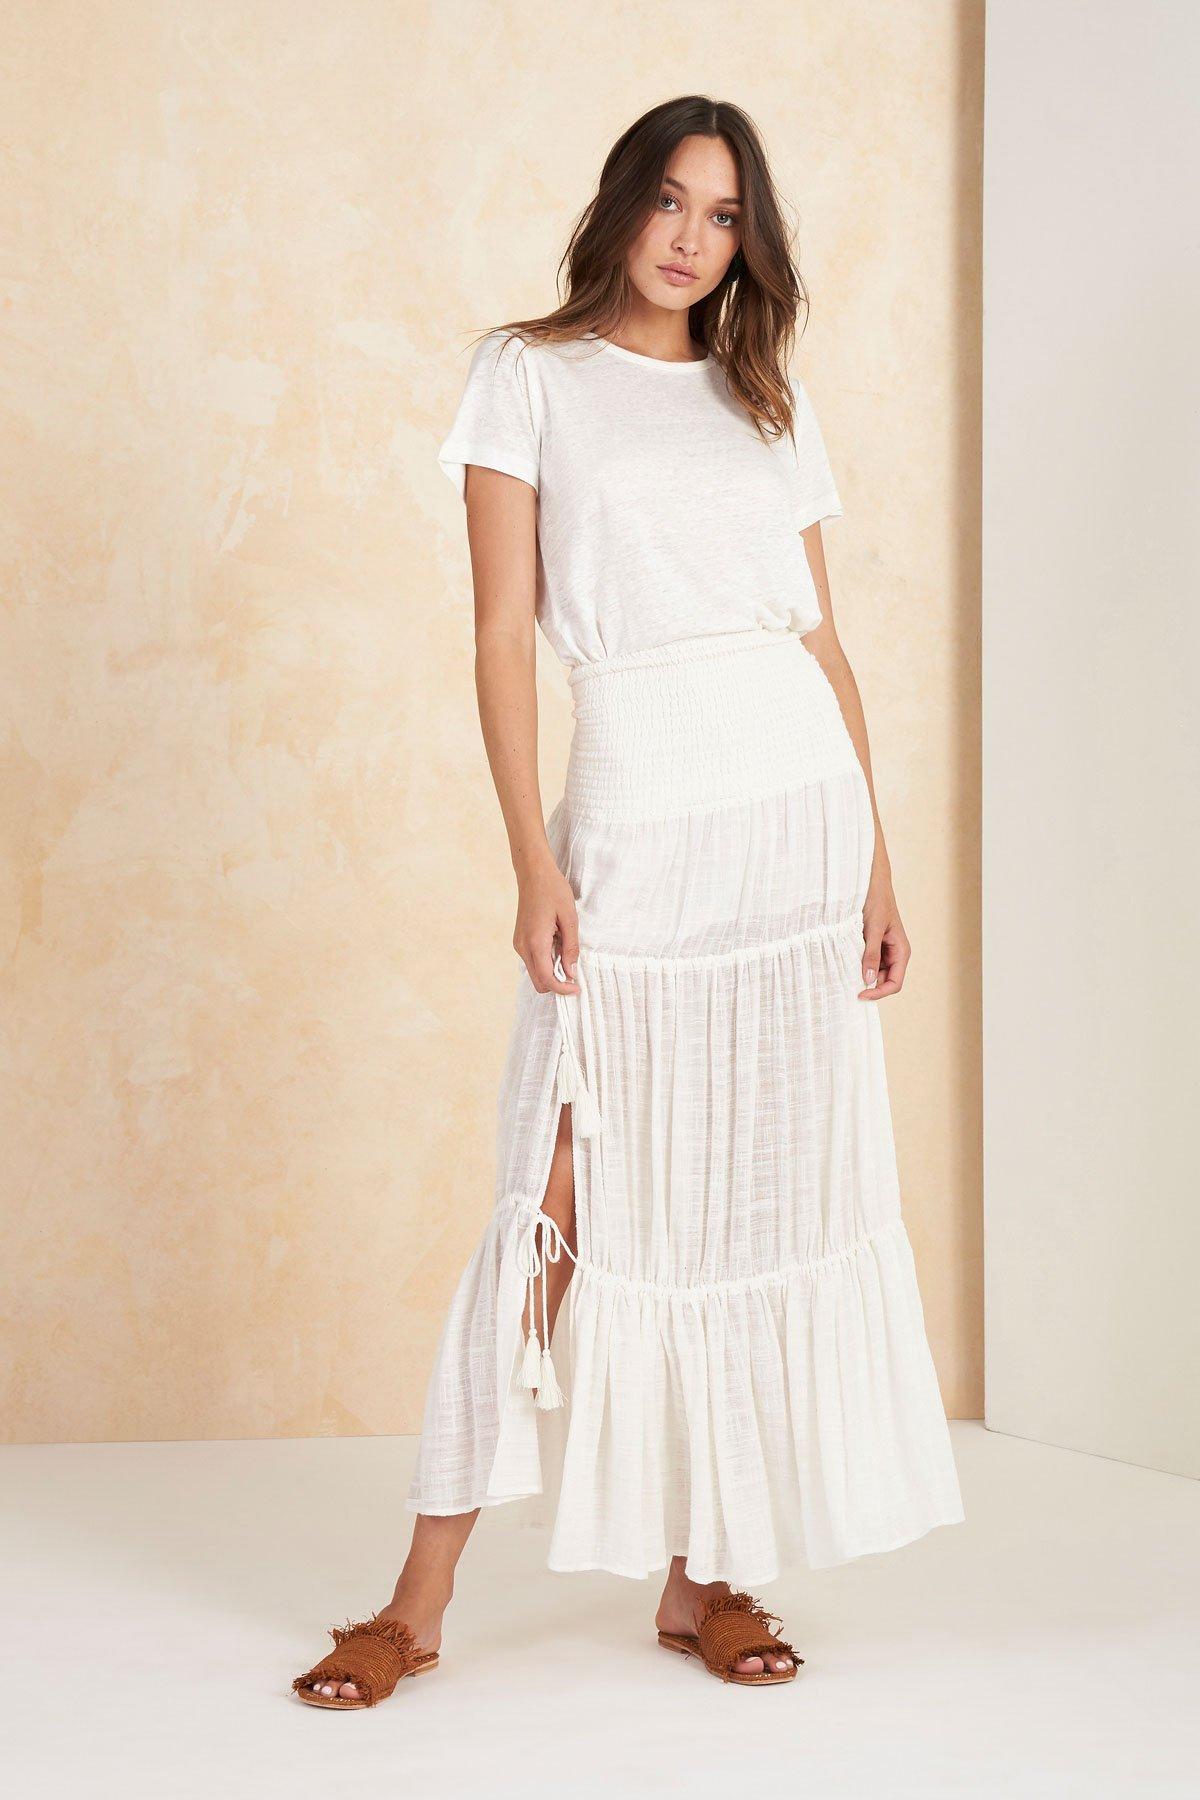 Image of Paradalis Maxi Skirt - White